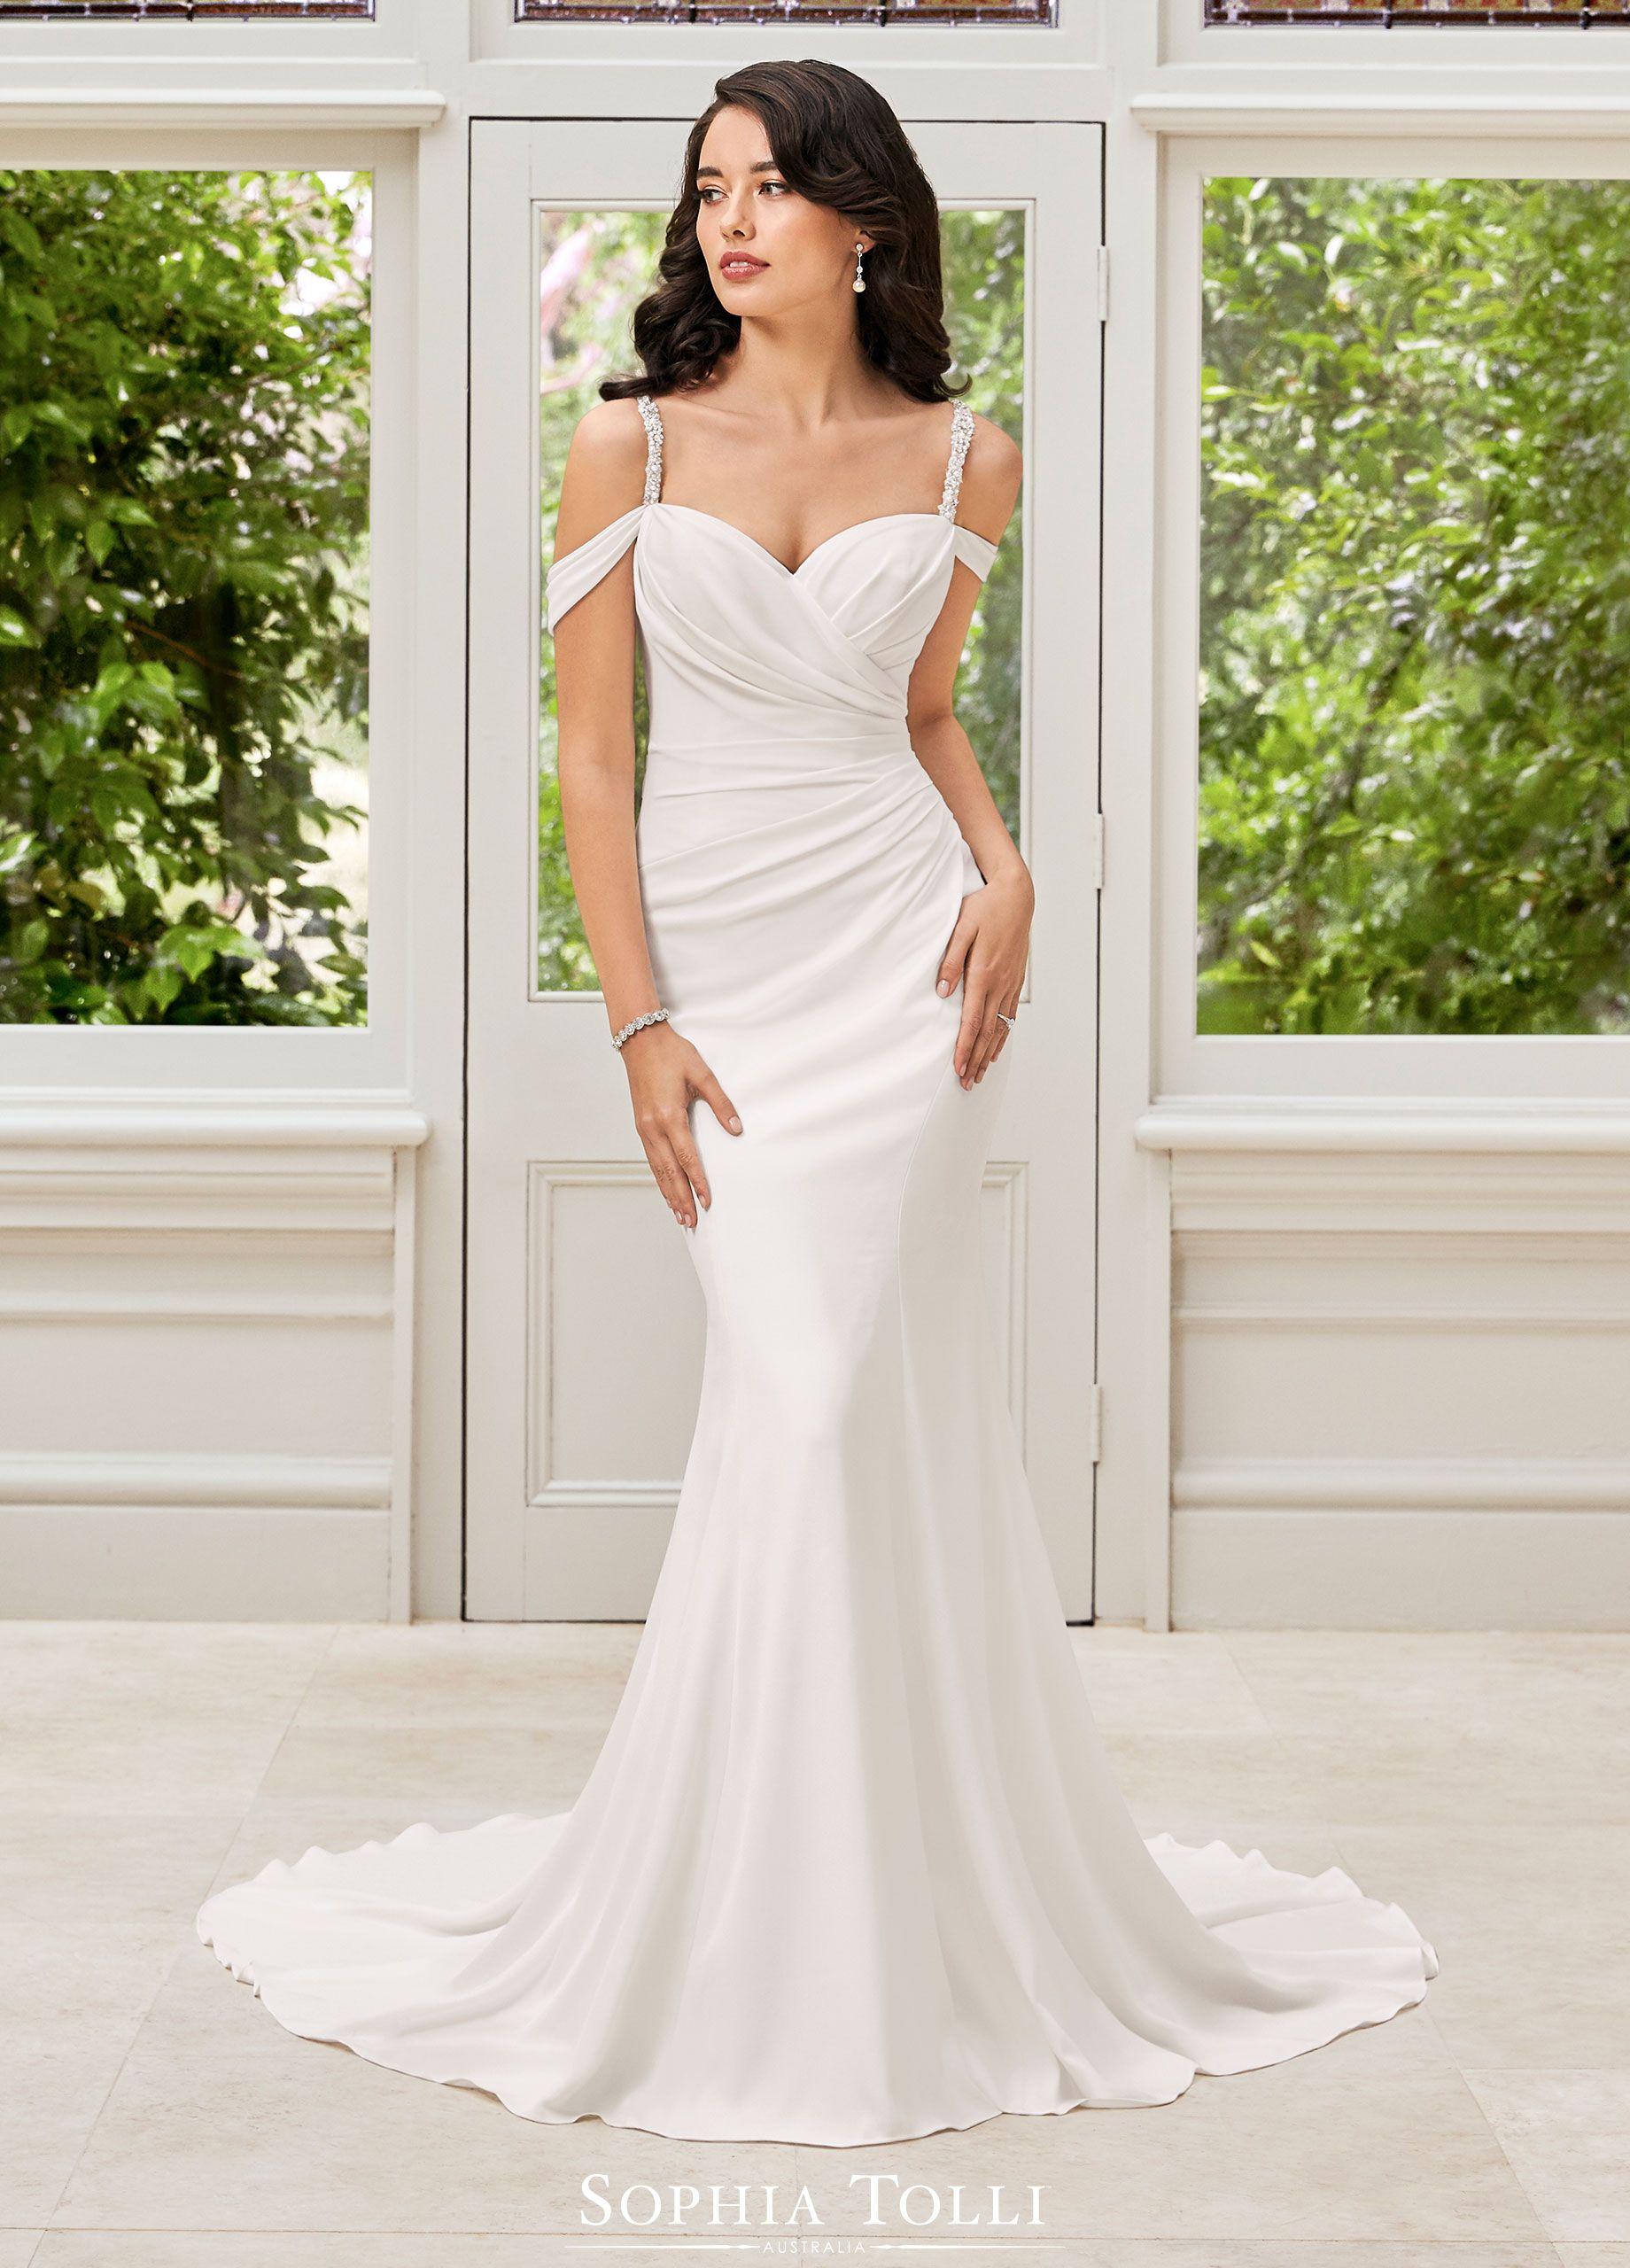 Sophia Tolli Wedding Gowns Y21976 Ines In 2020 Wedding Dresses